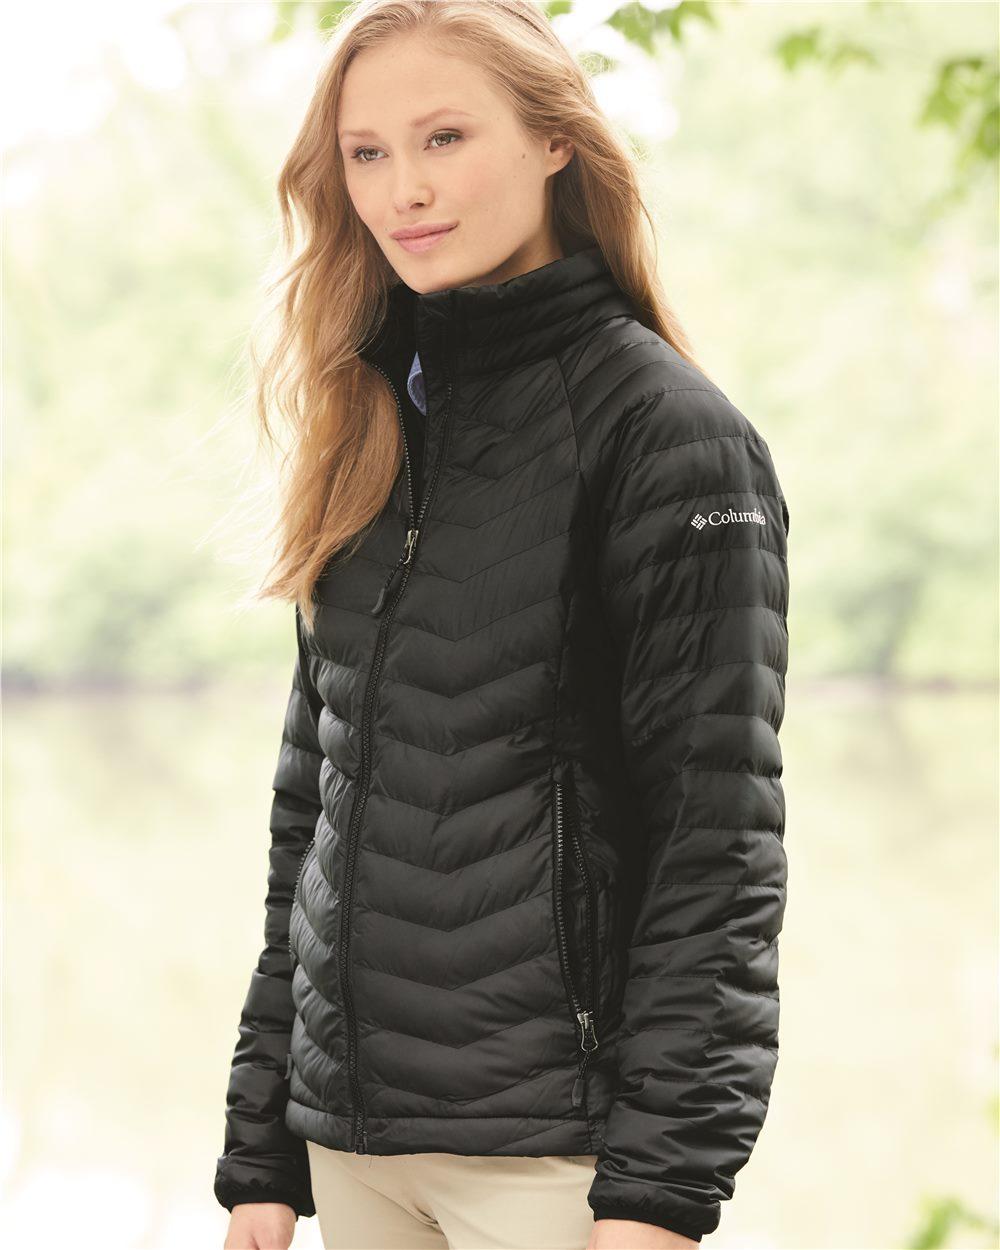 3be5b792c31b Columbia 173700 - Women's Oyanta Trail Puffer Jacket $82.19 ...